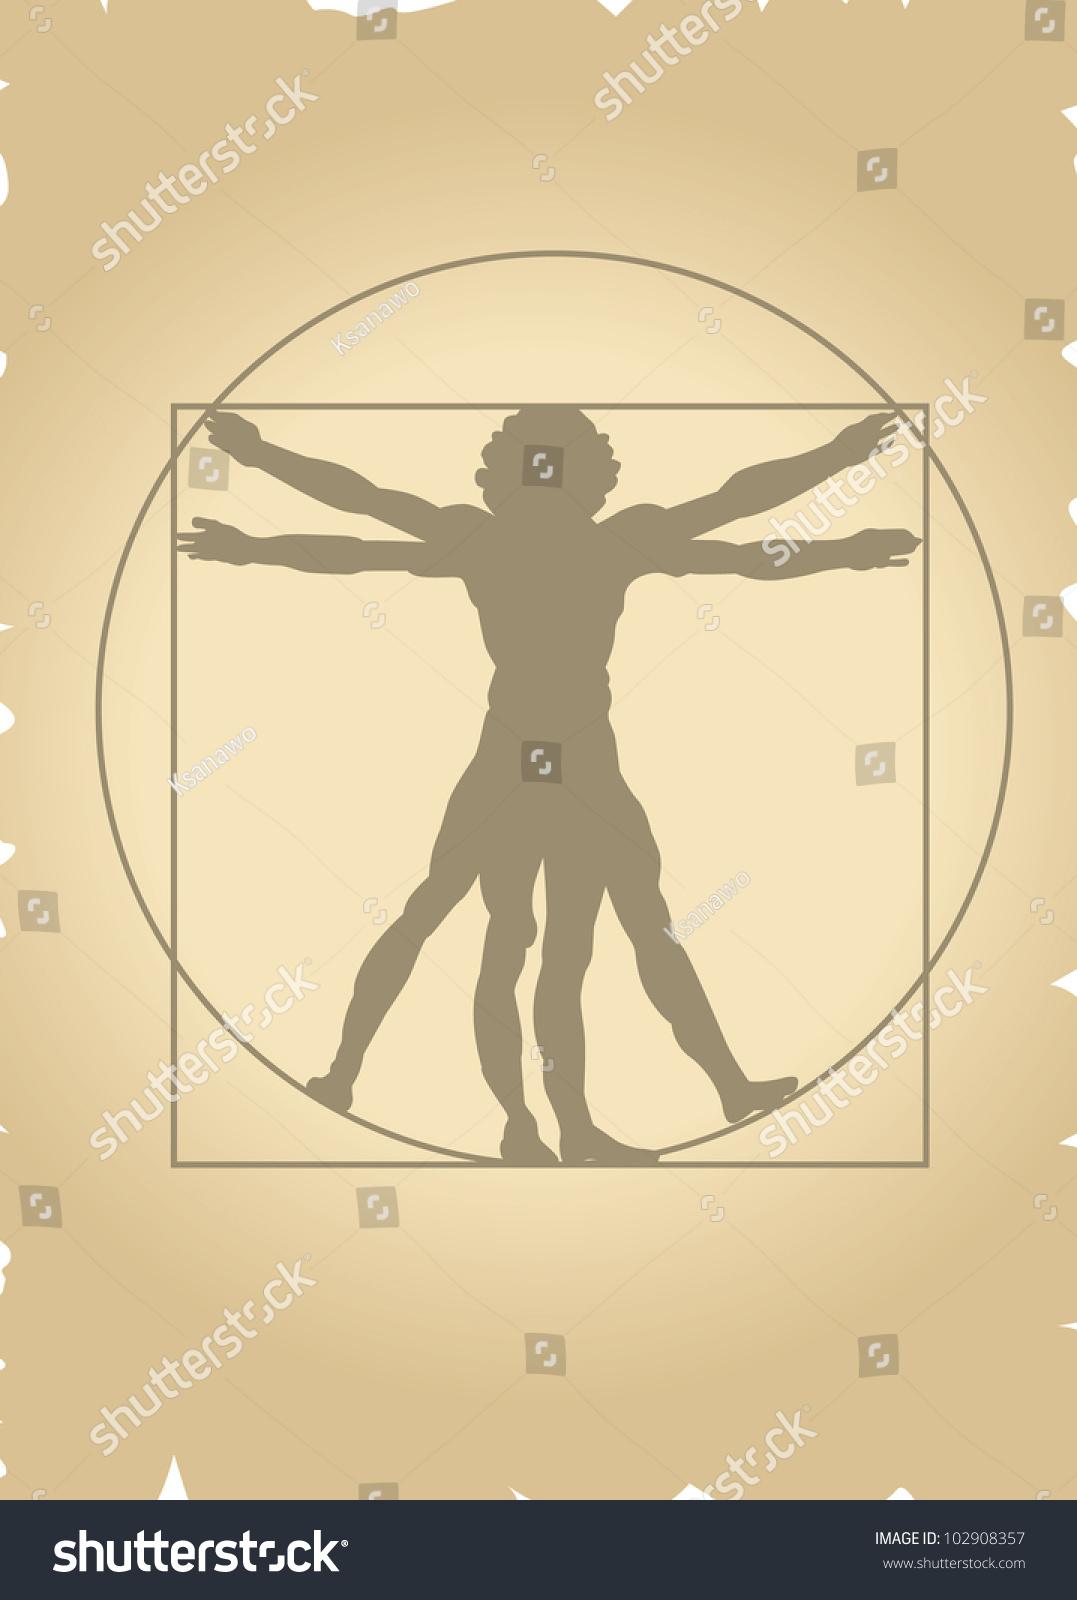 Vitruvian Man Vector Stock Vector 102908357 - Shutterstock